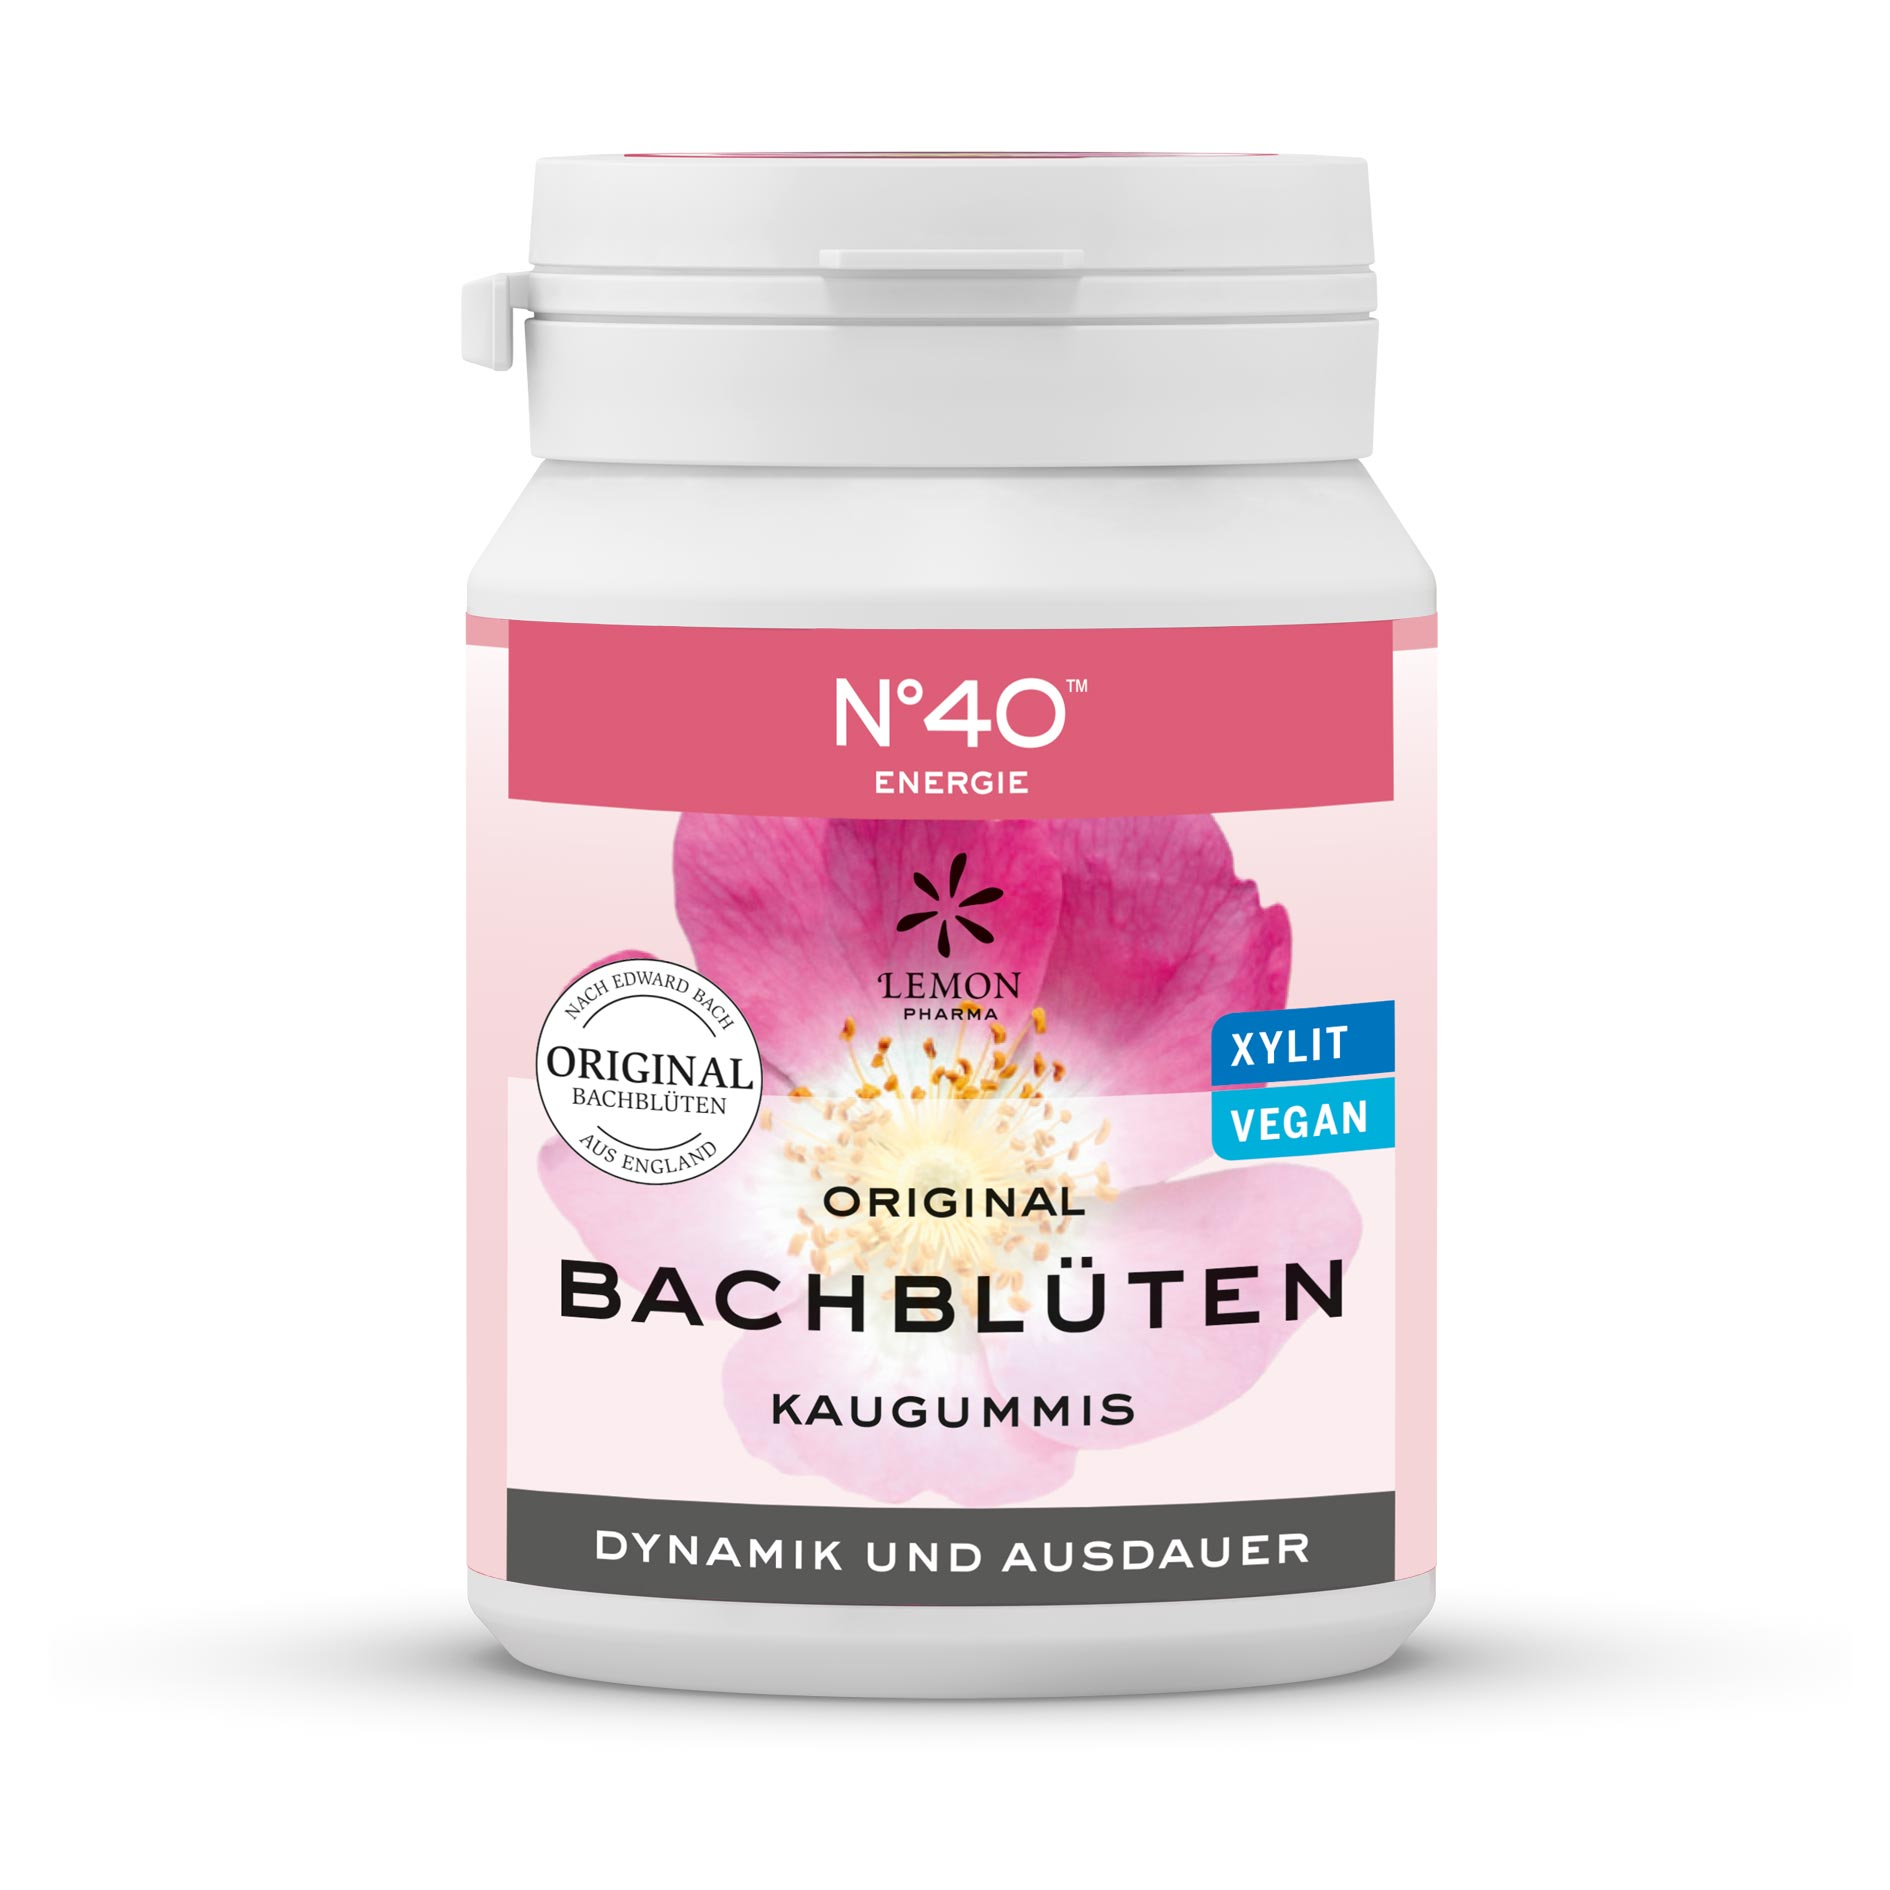 Gomma da masticare 40 Energia Fiori di Bach originali Lemon Pharma Bach flowers dinamismo e resistenza xylit vegan chewing gum